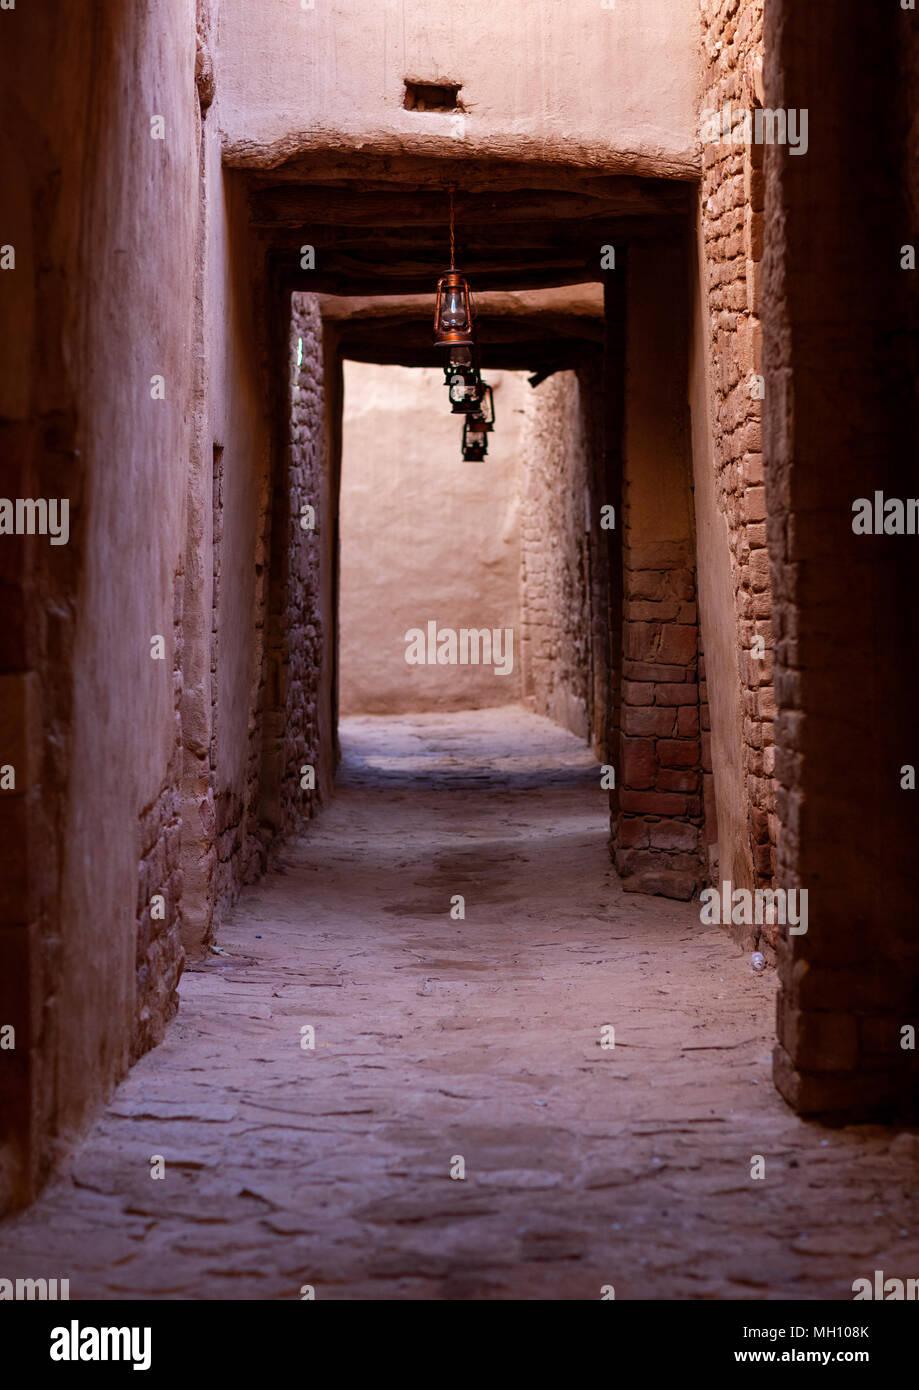 Alley in the old town, Al Madinah Province, Al-Ula, Saudi Arabia - Stock Image